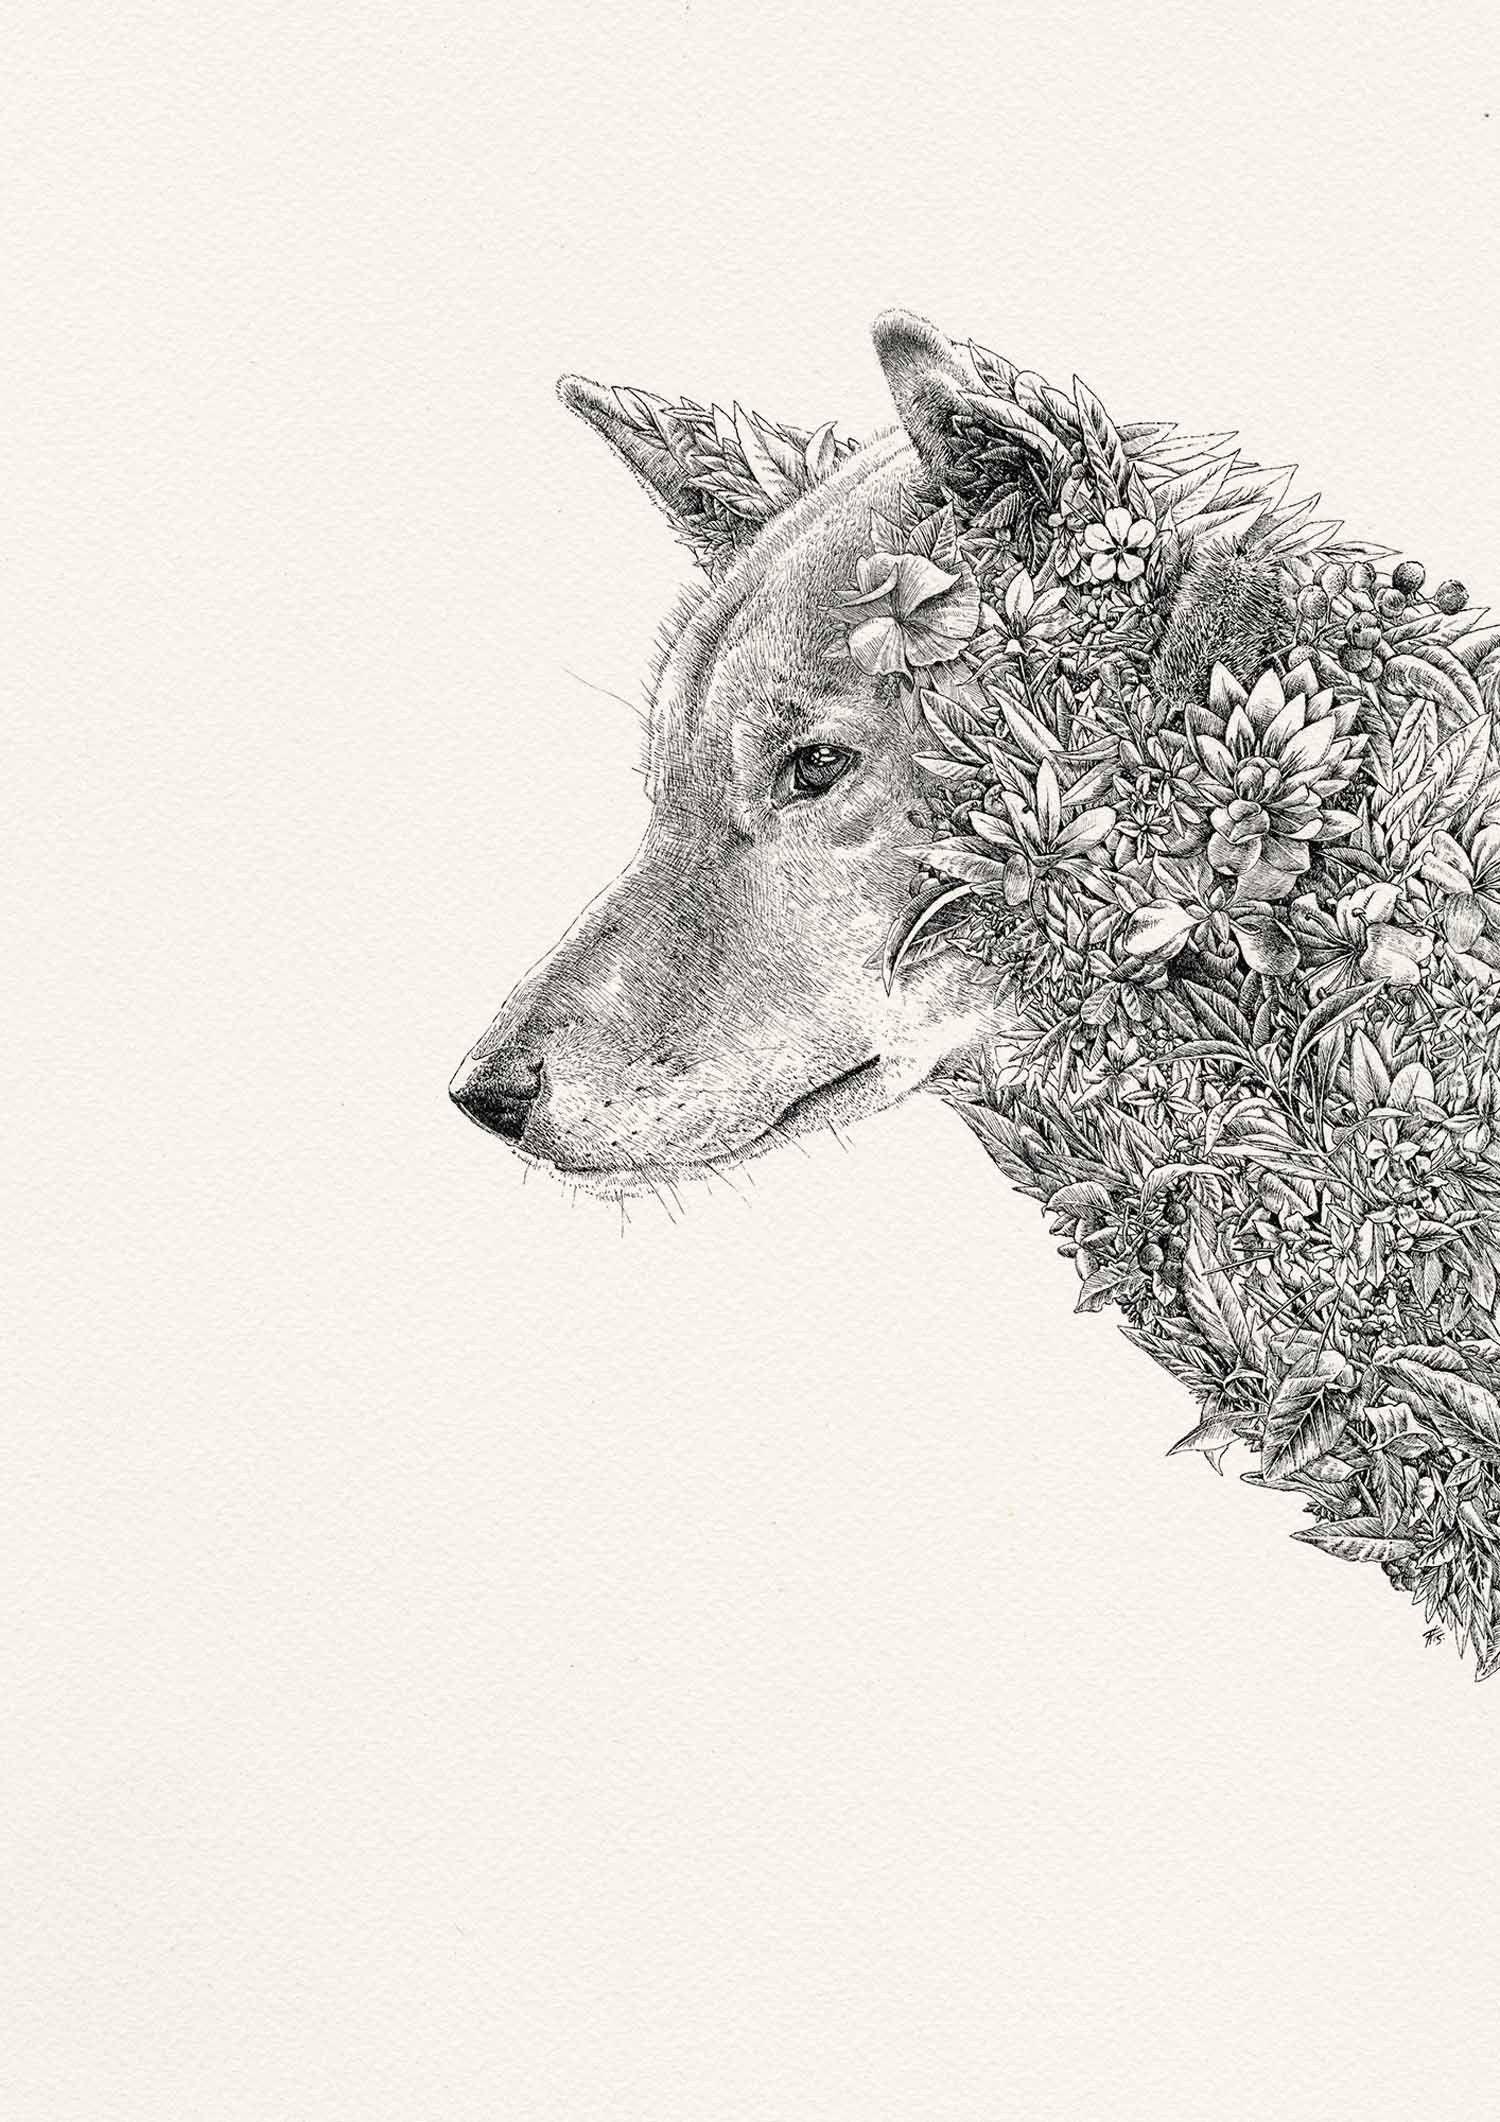 Dingo, by Nathan Ferlazzo